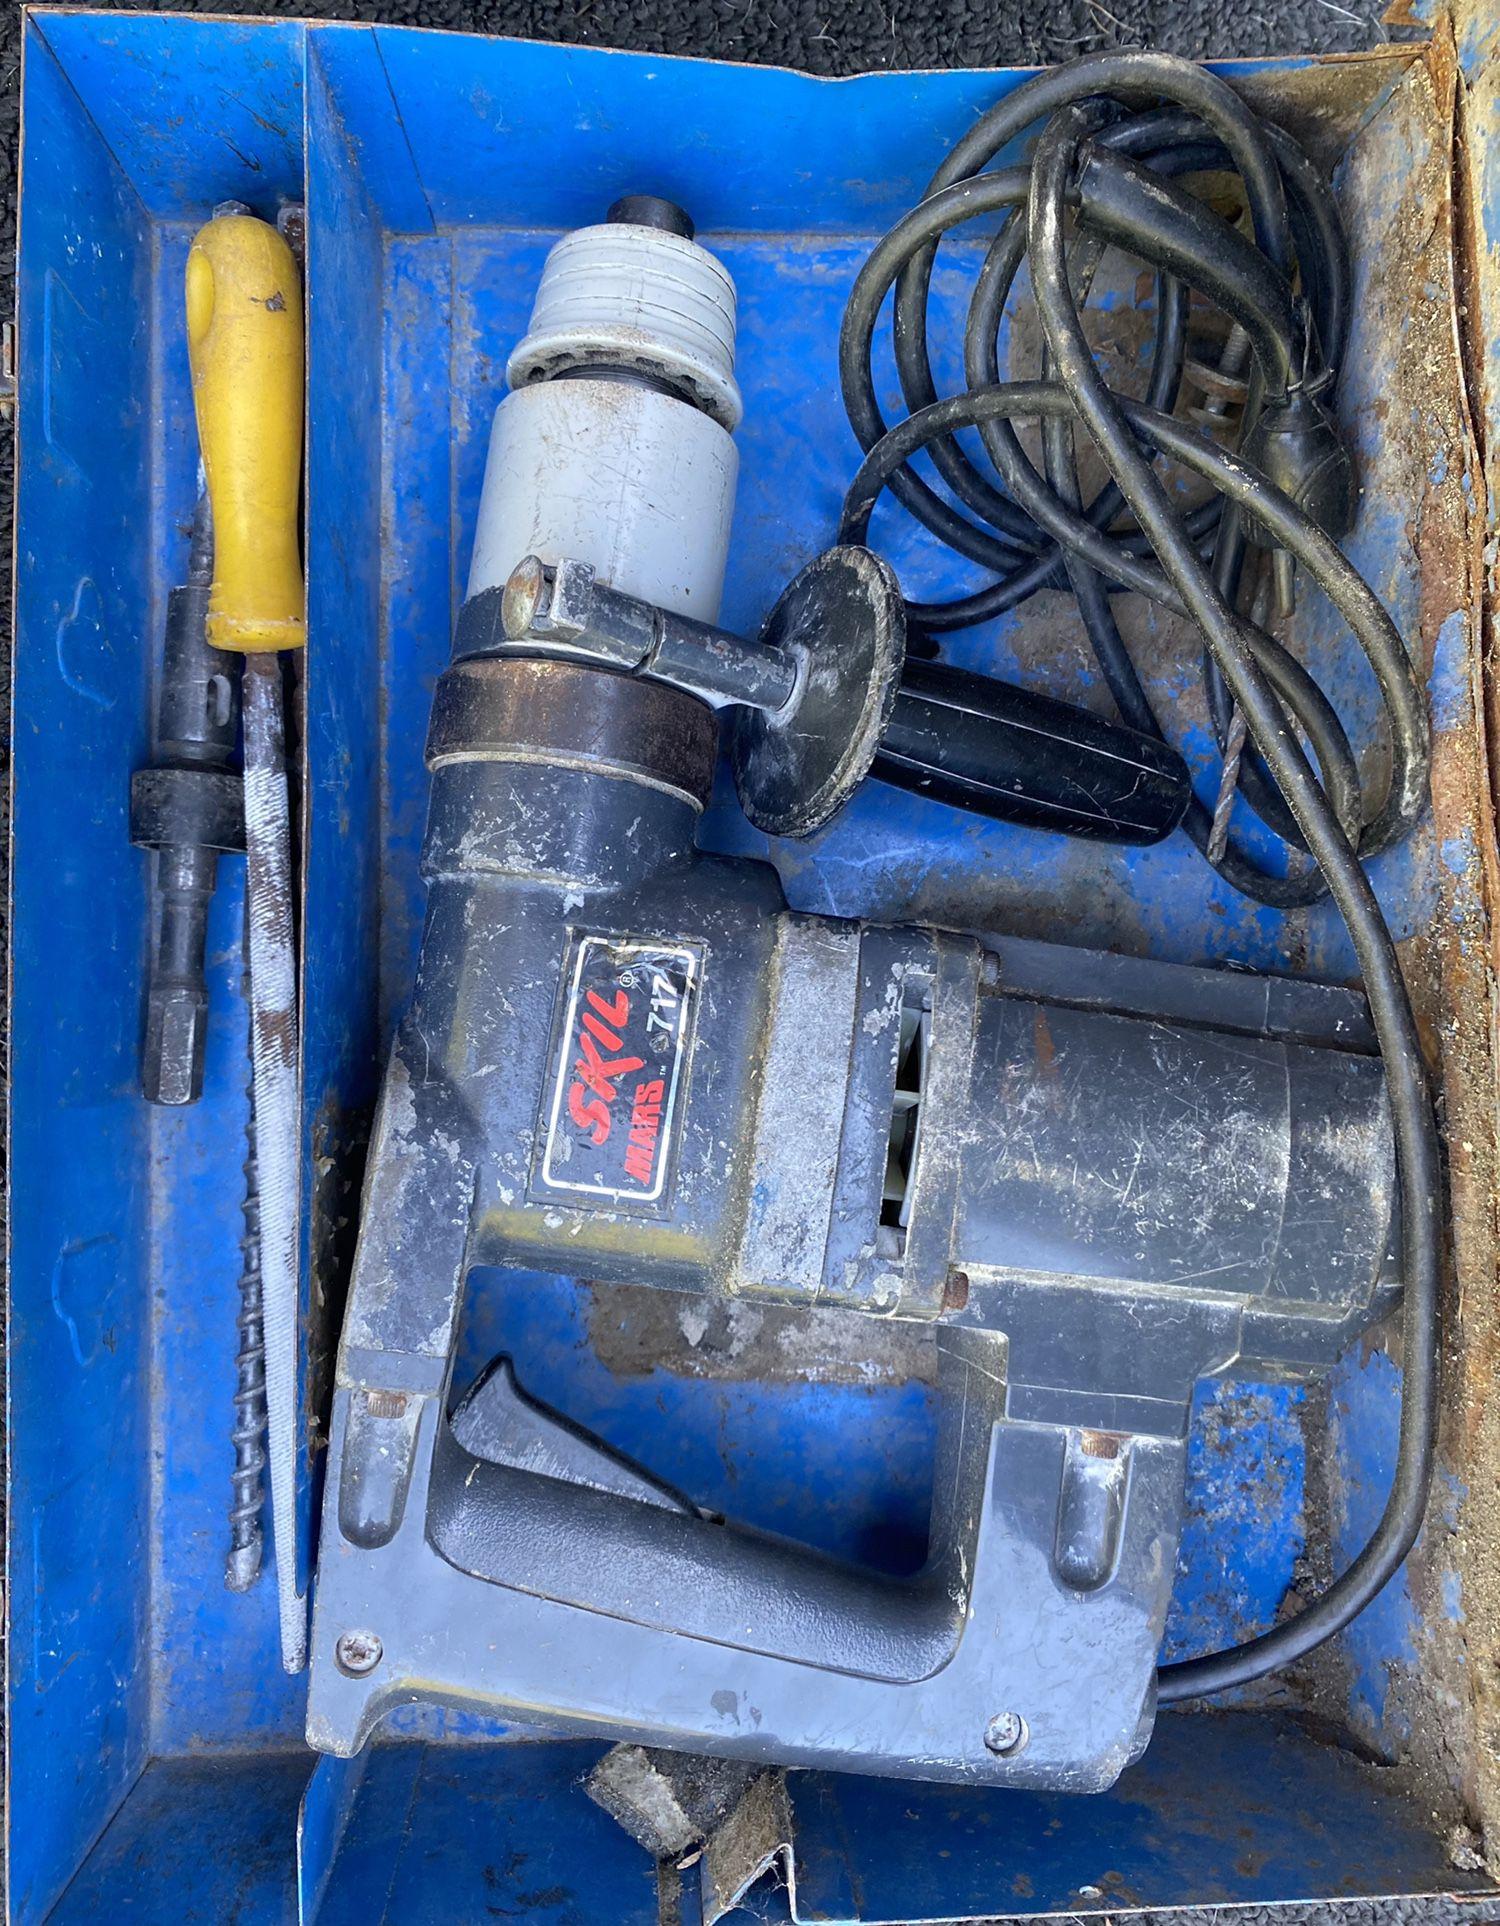 Skil Roto Hammer 717 hammer drill in metal case